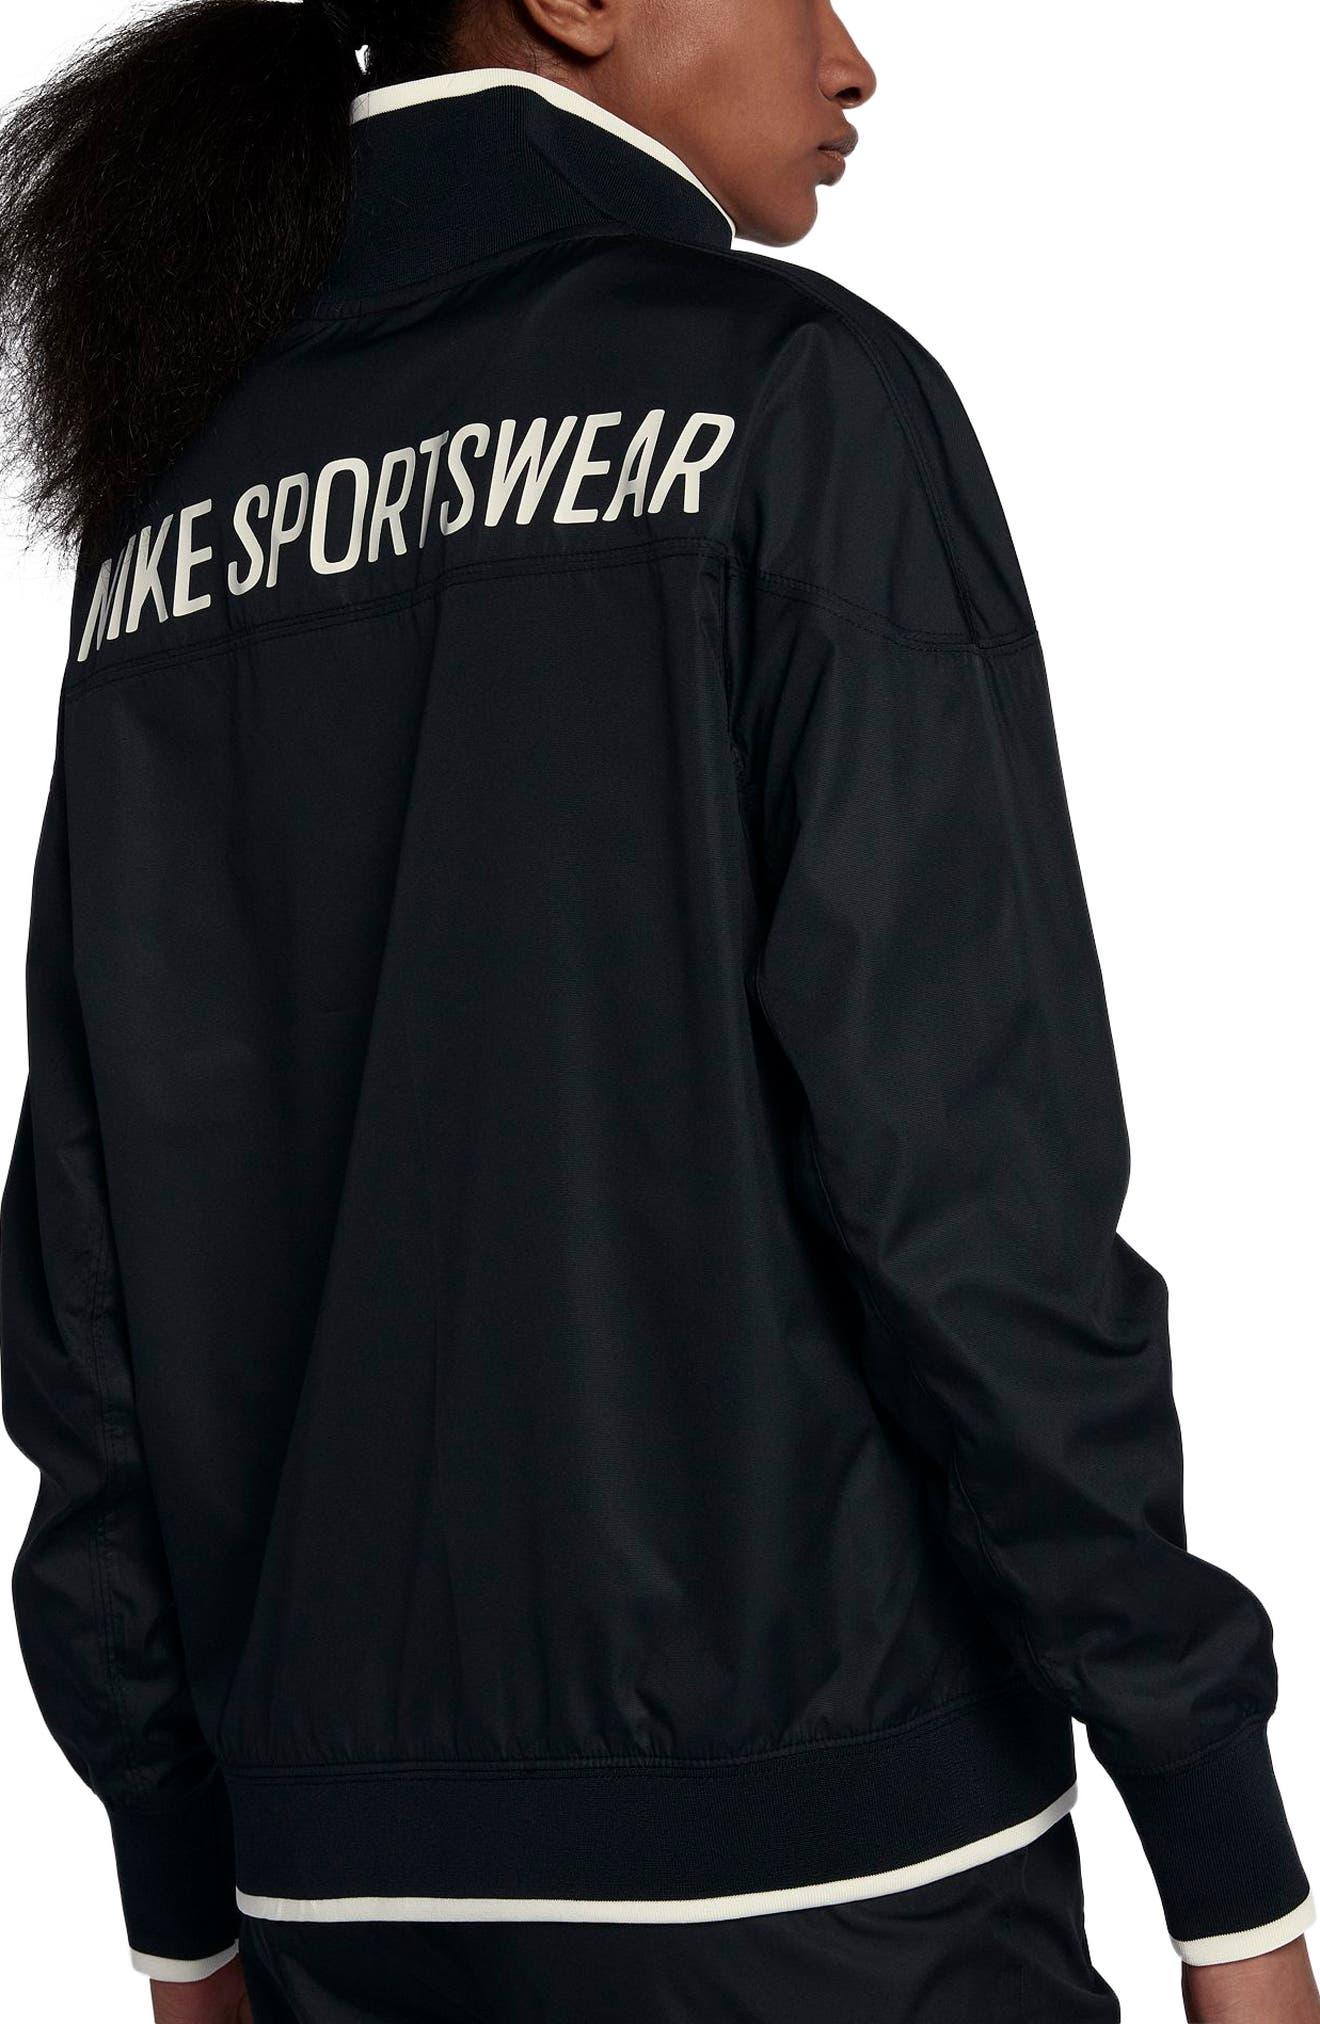 Sportswear Archive Jacket,                             Alternate thumbnail 2, color,                             010